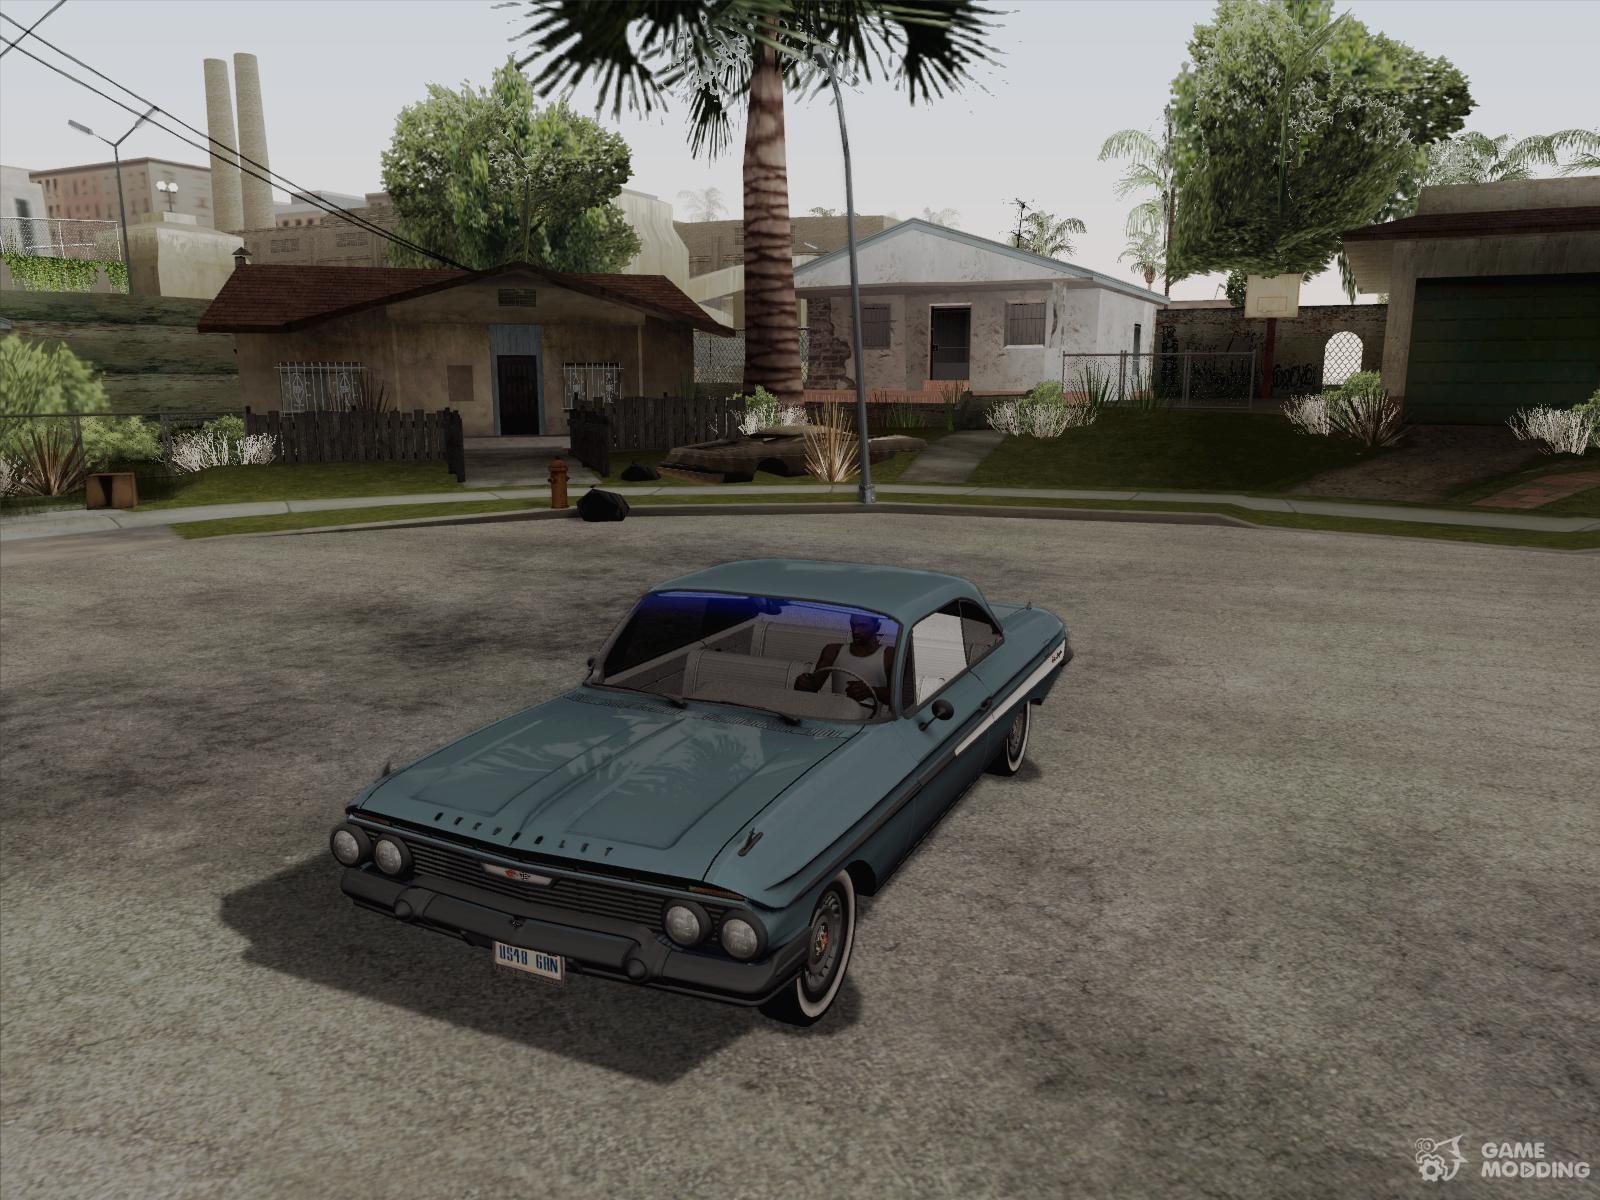 Chevrolet impala 4 door hardtop 1963 for gta san andreas - Chevrolet Impala 61 For Gta San Andreas